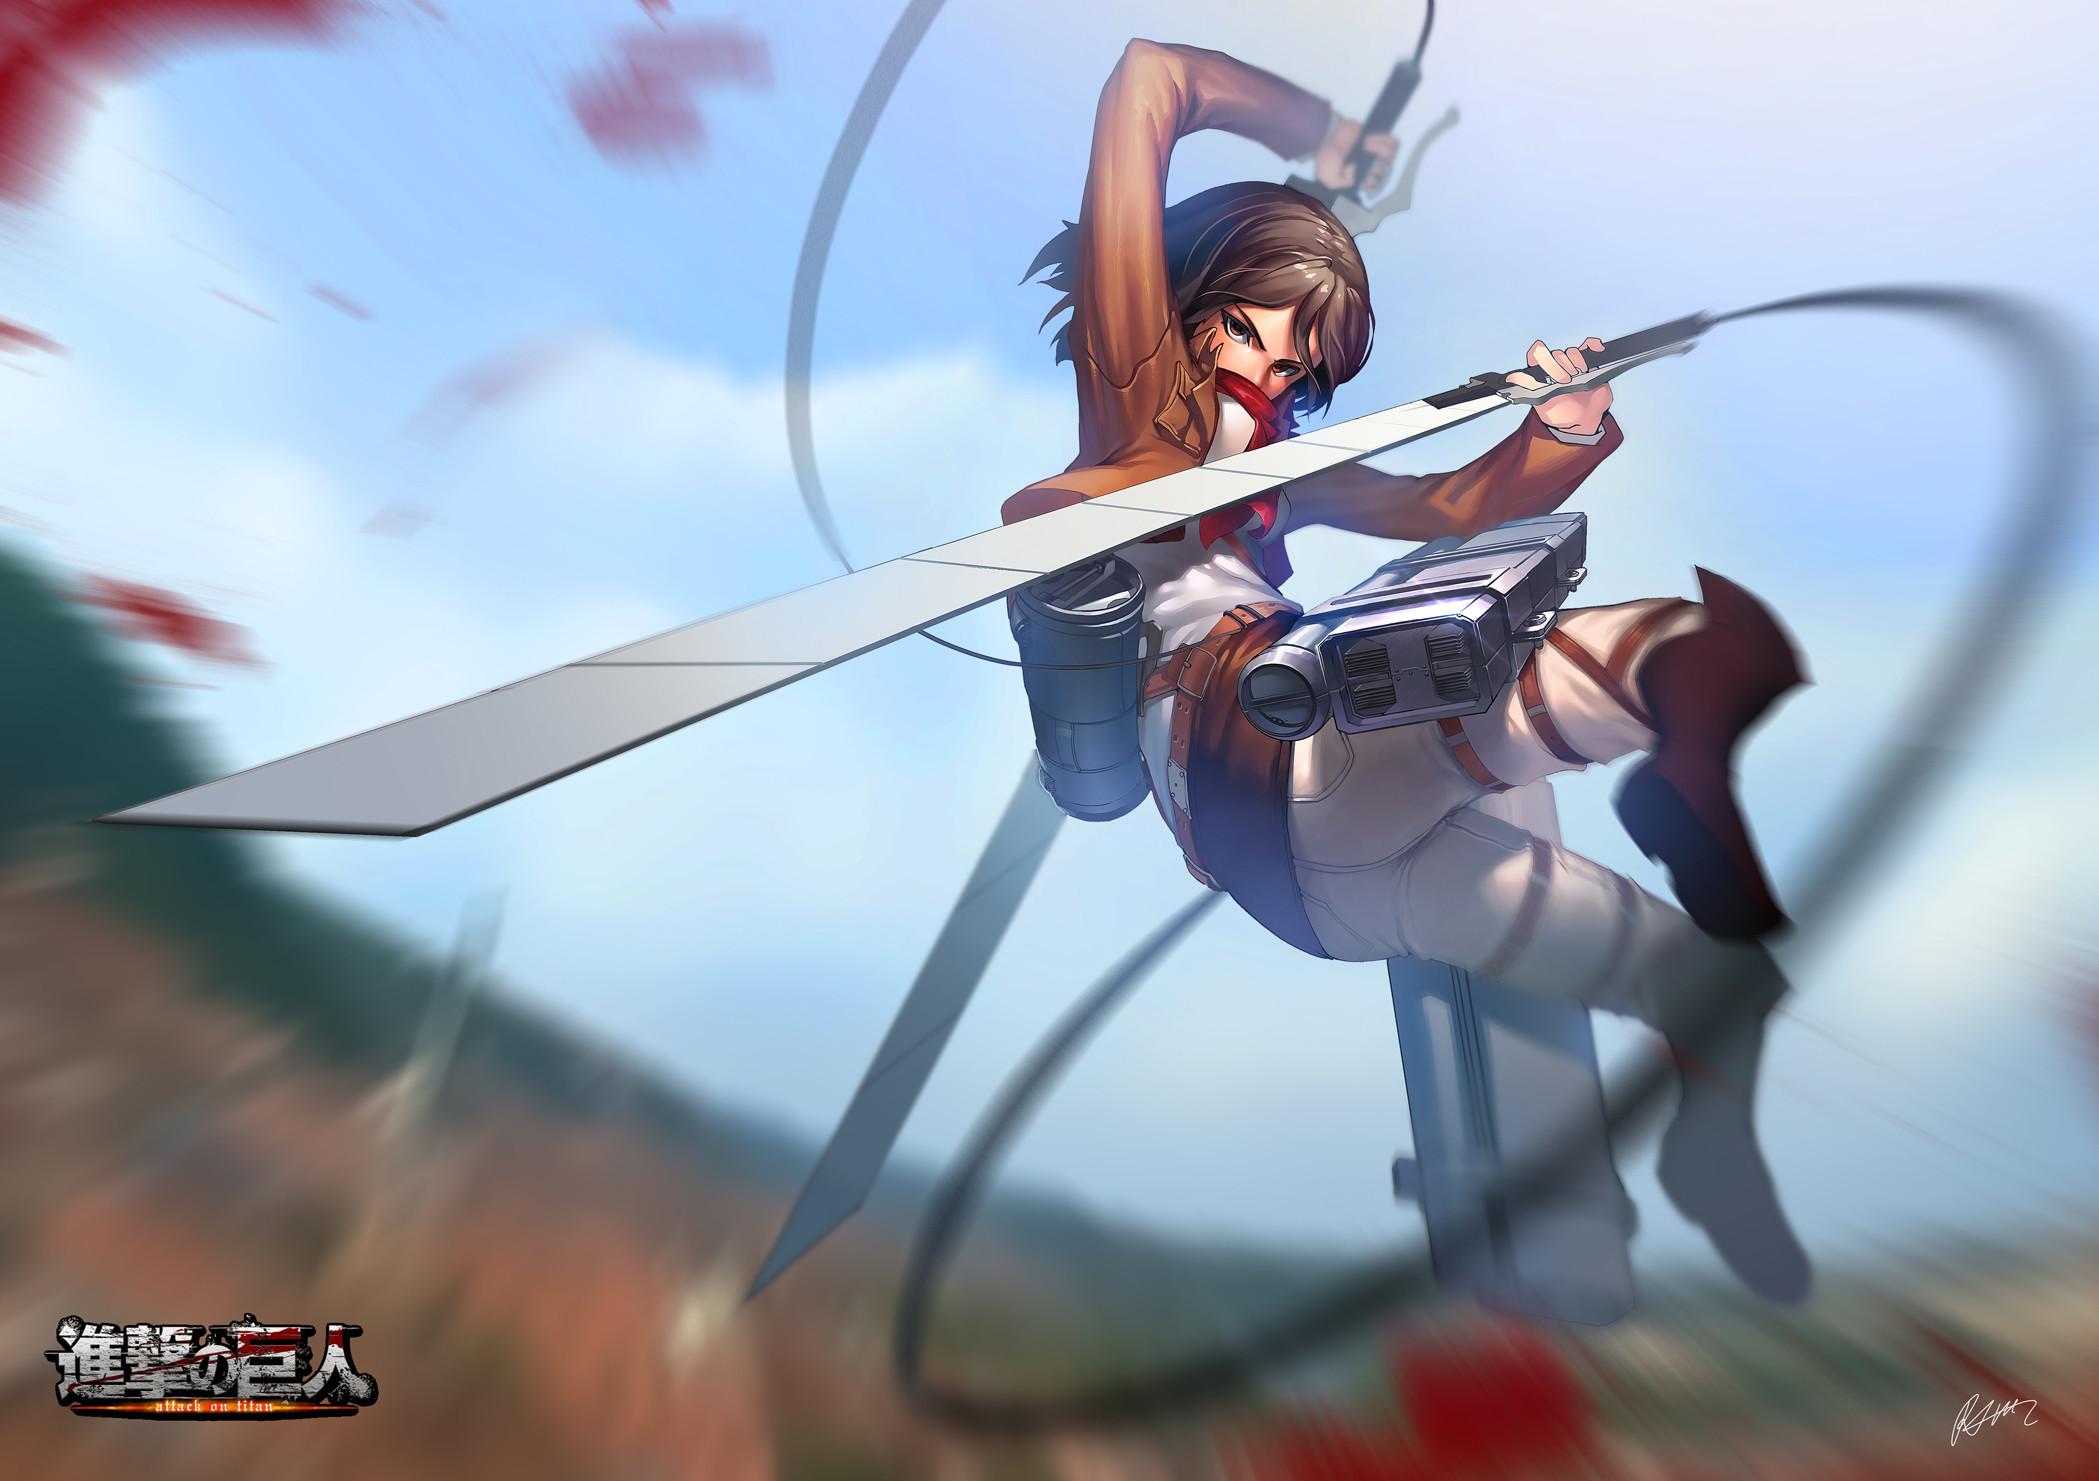 Mikasa Ackerman – Shingeki no Kyojin / Attack on Titan,Anime